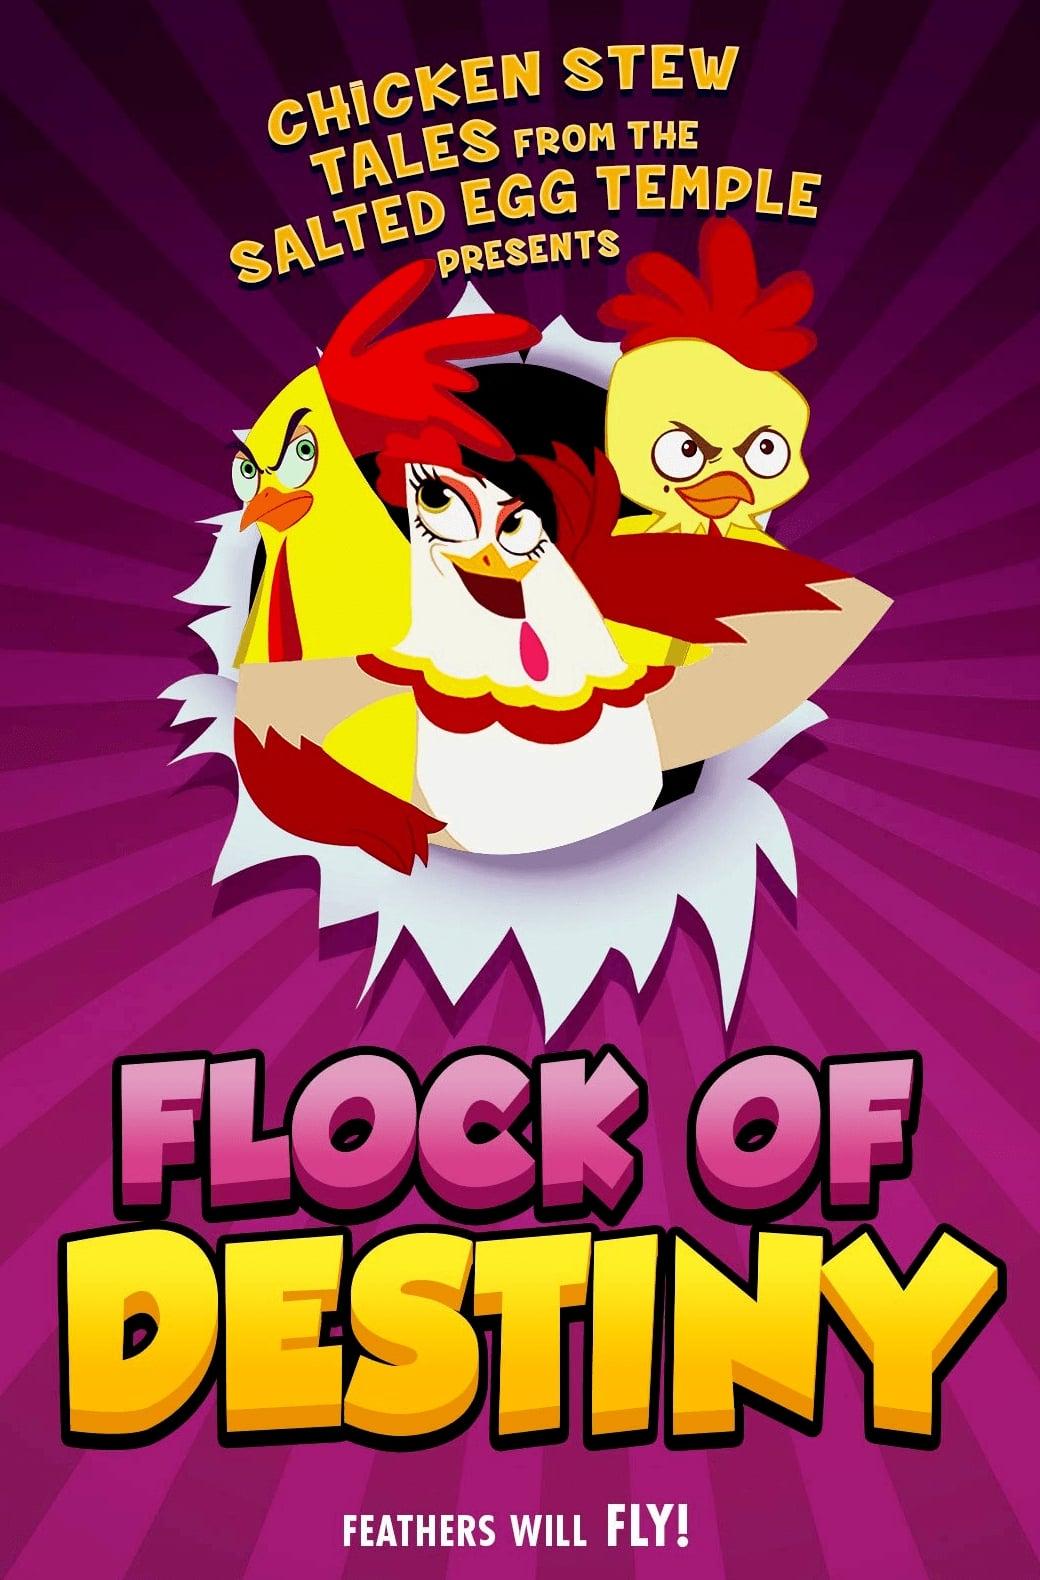 The Flock of Destiny